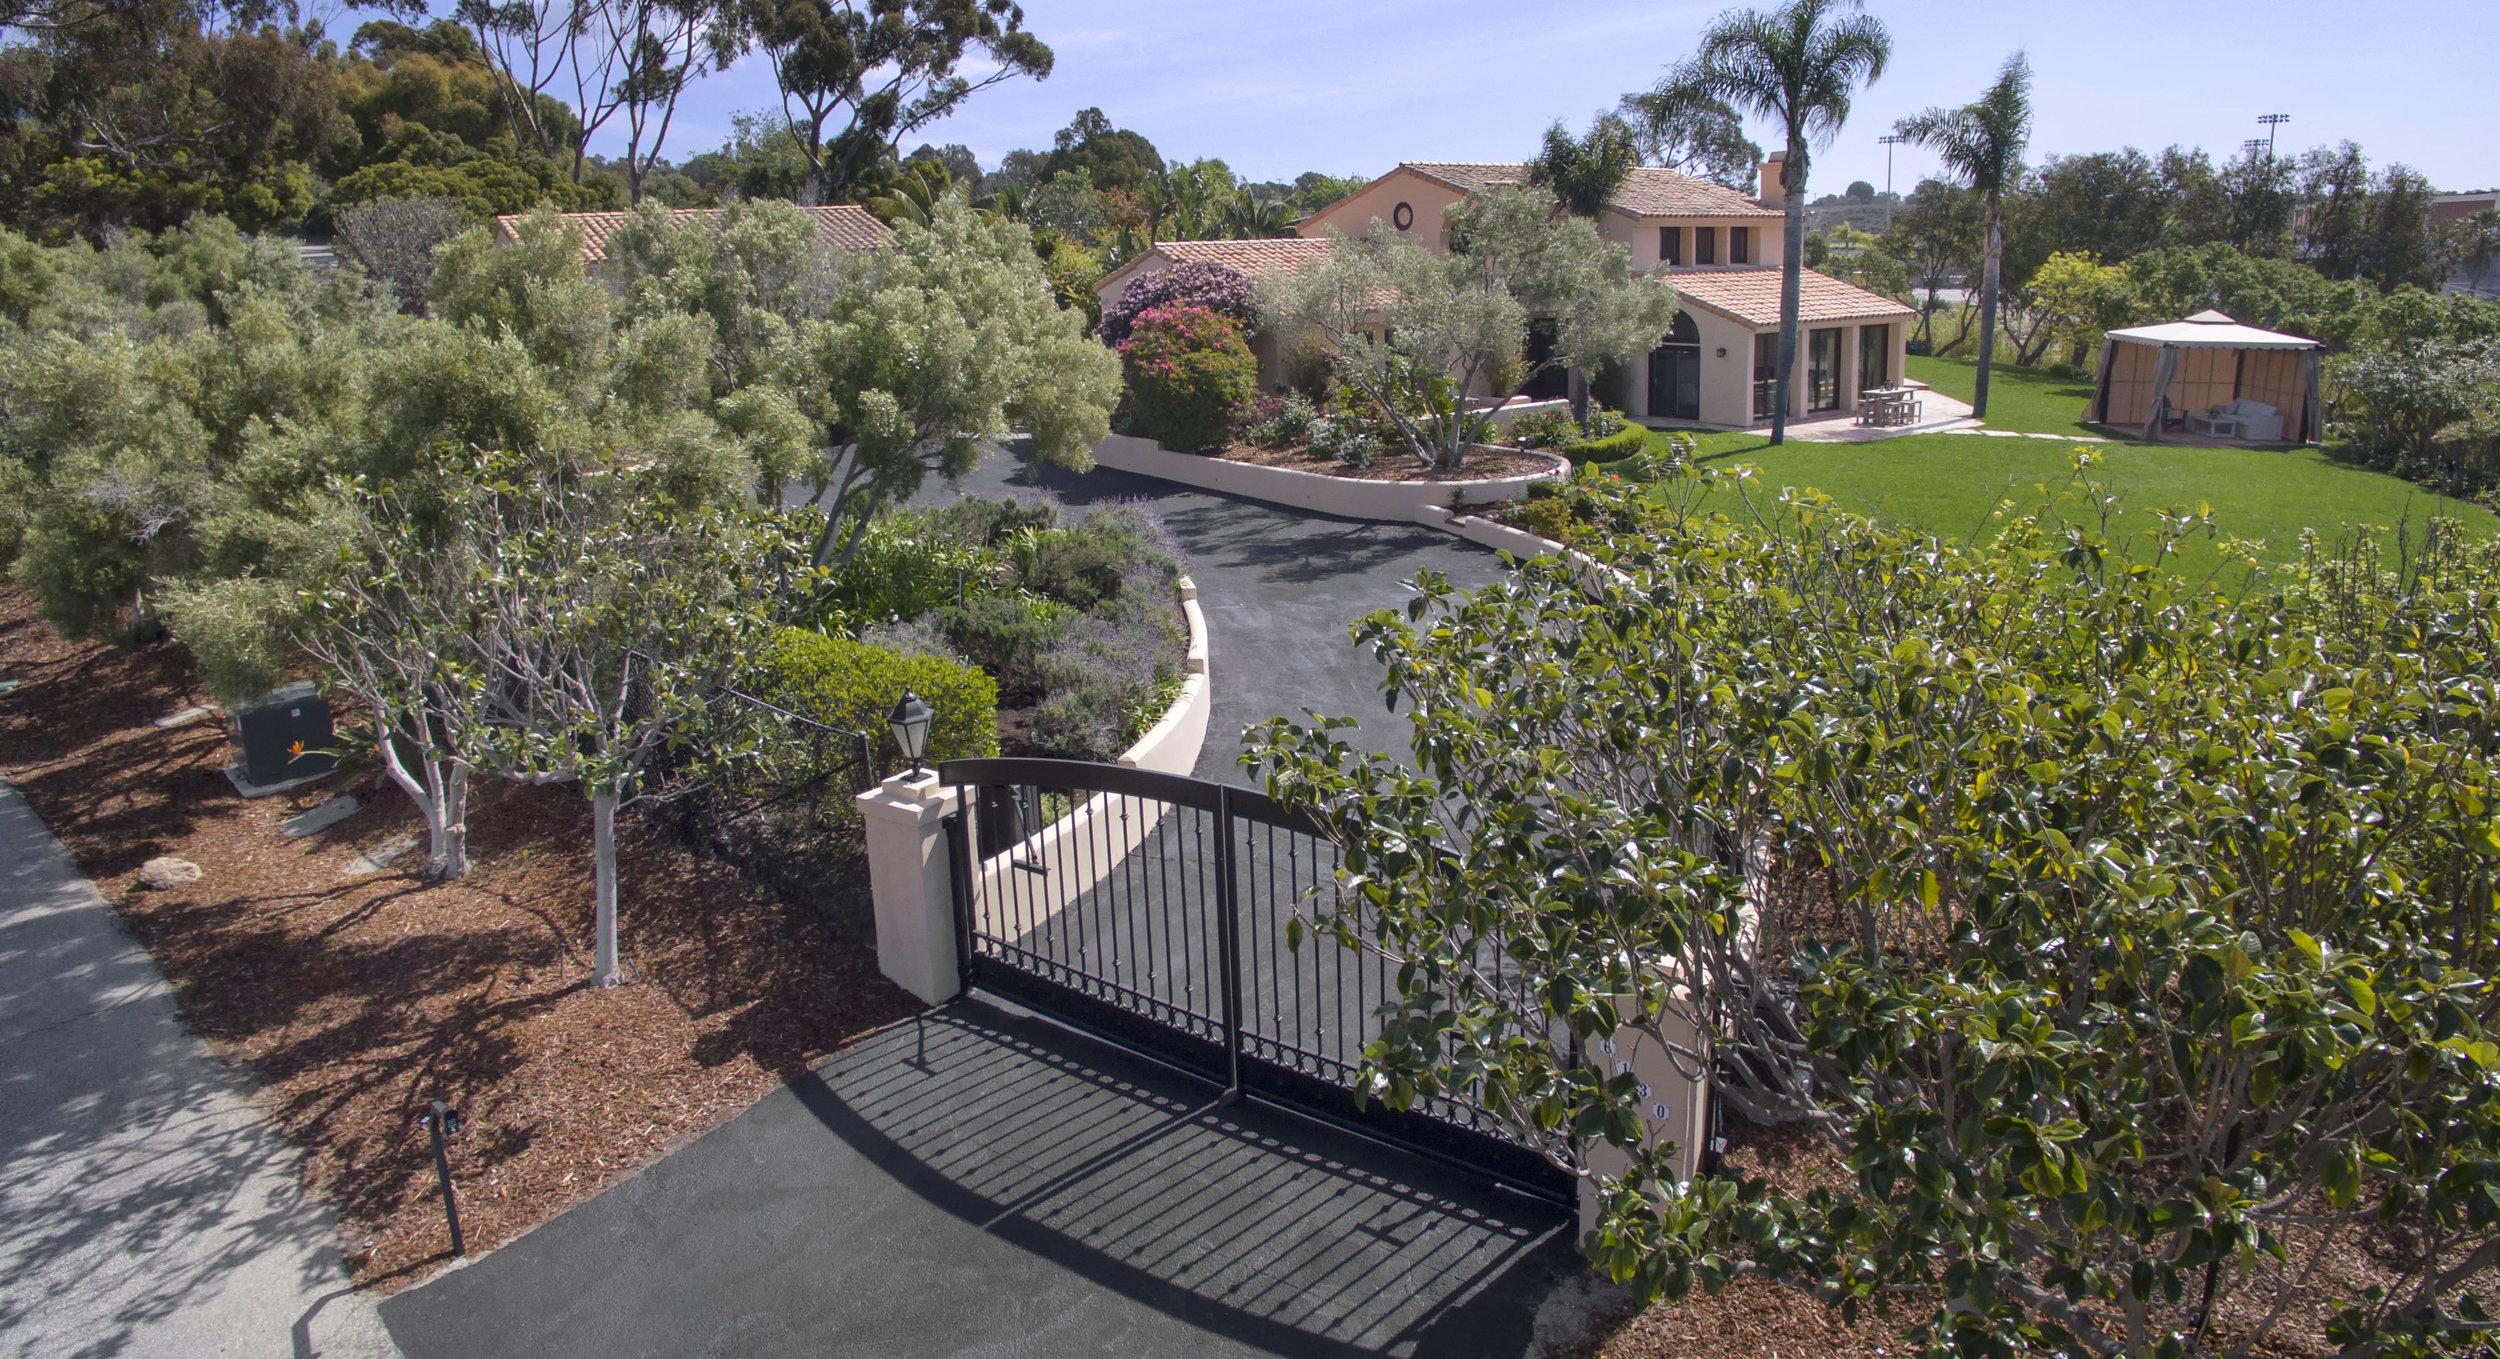 022 Gates 6130 Via Cabrillo For Sale Lease The Malibu Life Team Luxury Real Estate.jpg